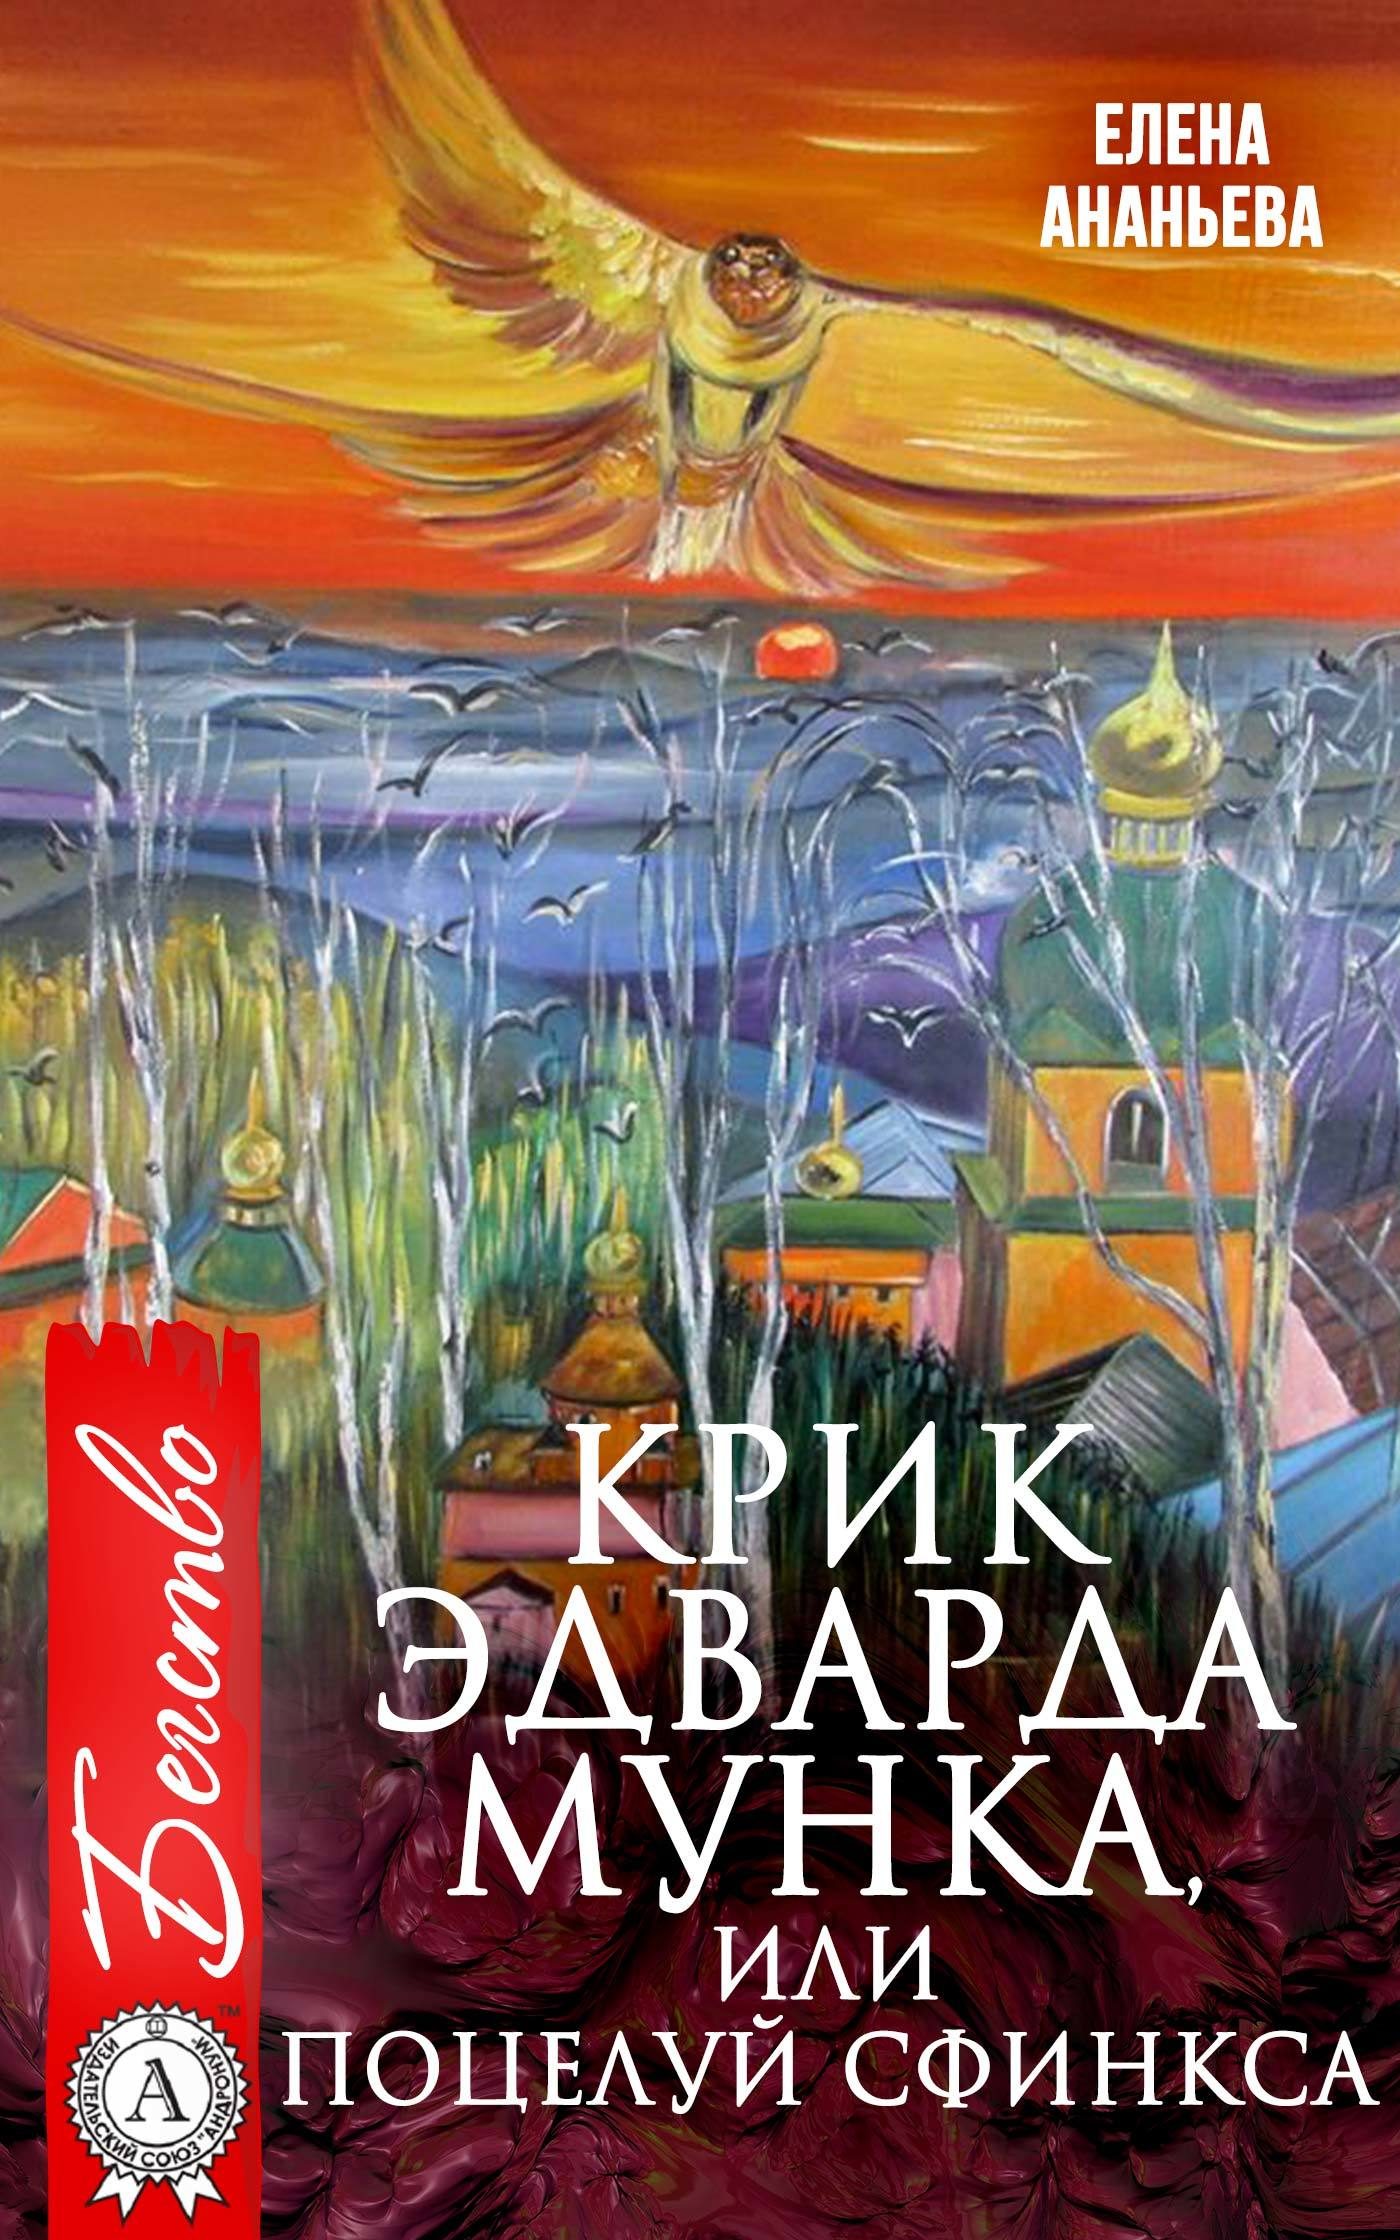 Елена Ананьева - Крик Эдварда Мунка, или Поцелуй сфинкса